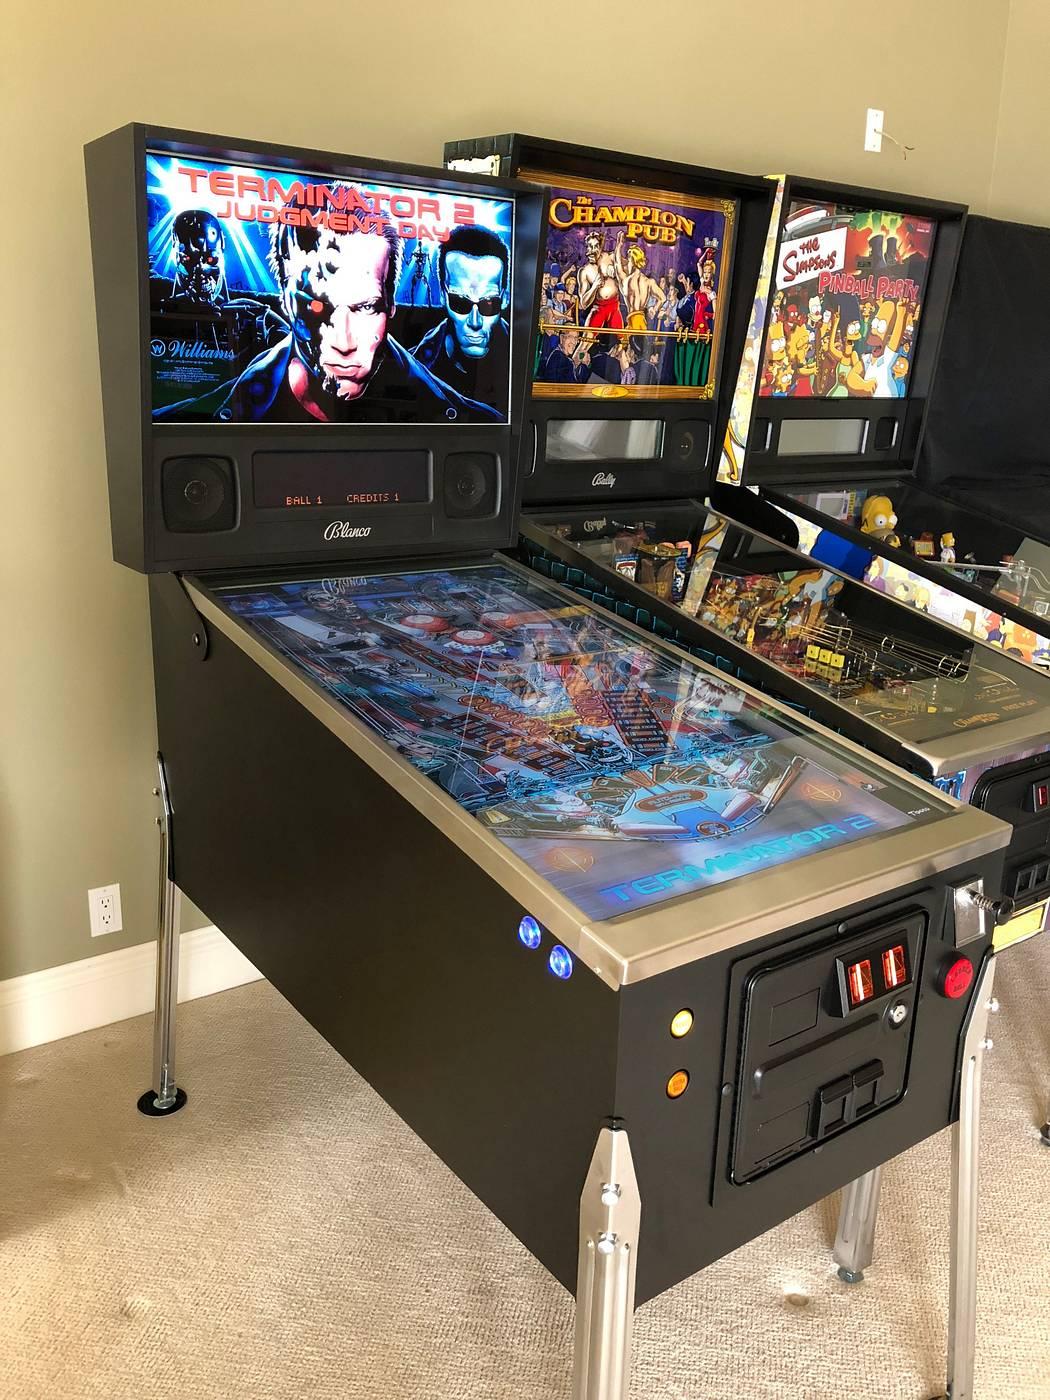 Virtual Pinball Machine - 3 Displays + Force Feedback + More